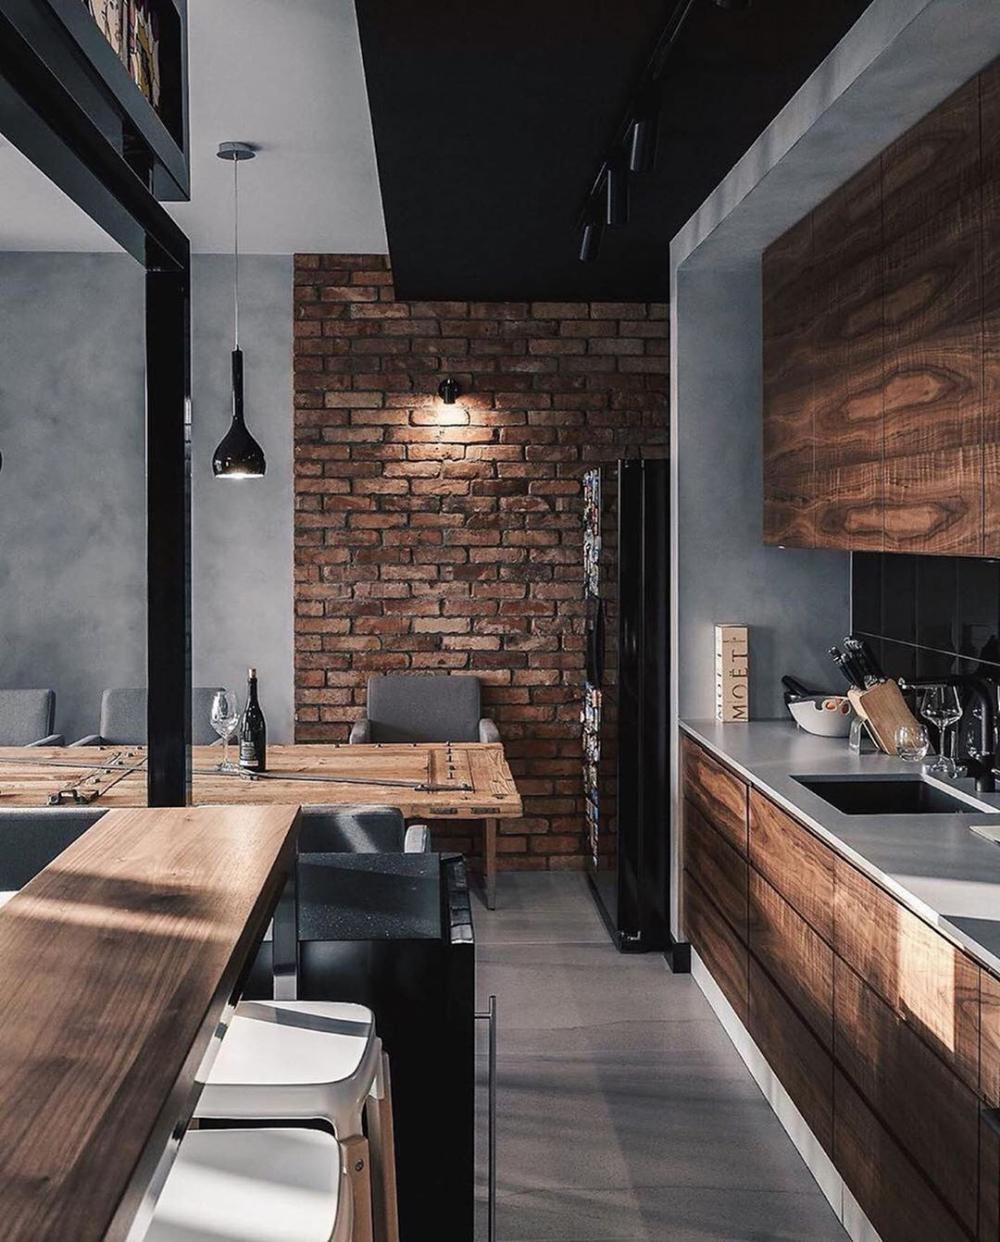 Spaces On Twitter Loft Interior Design Hipster Home Decor Loft Interiors